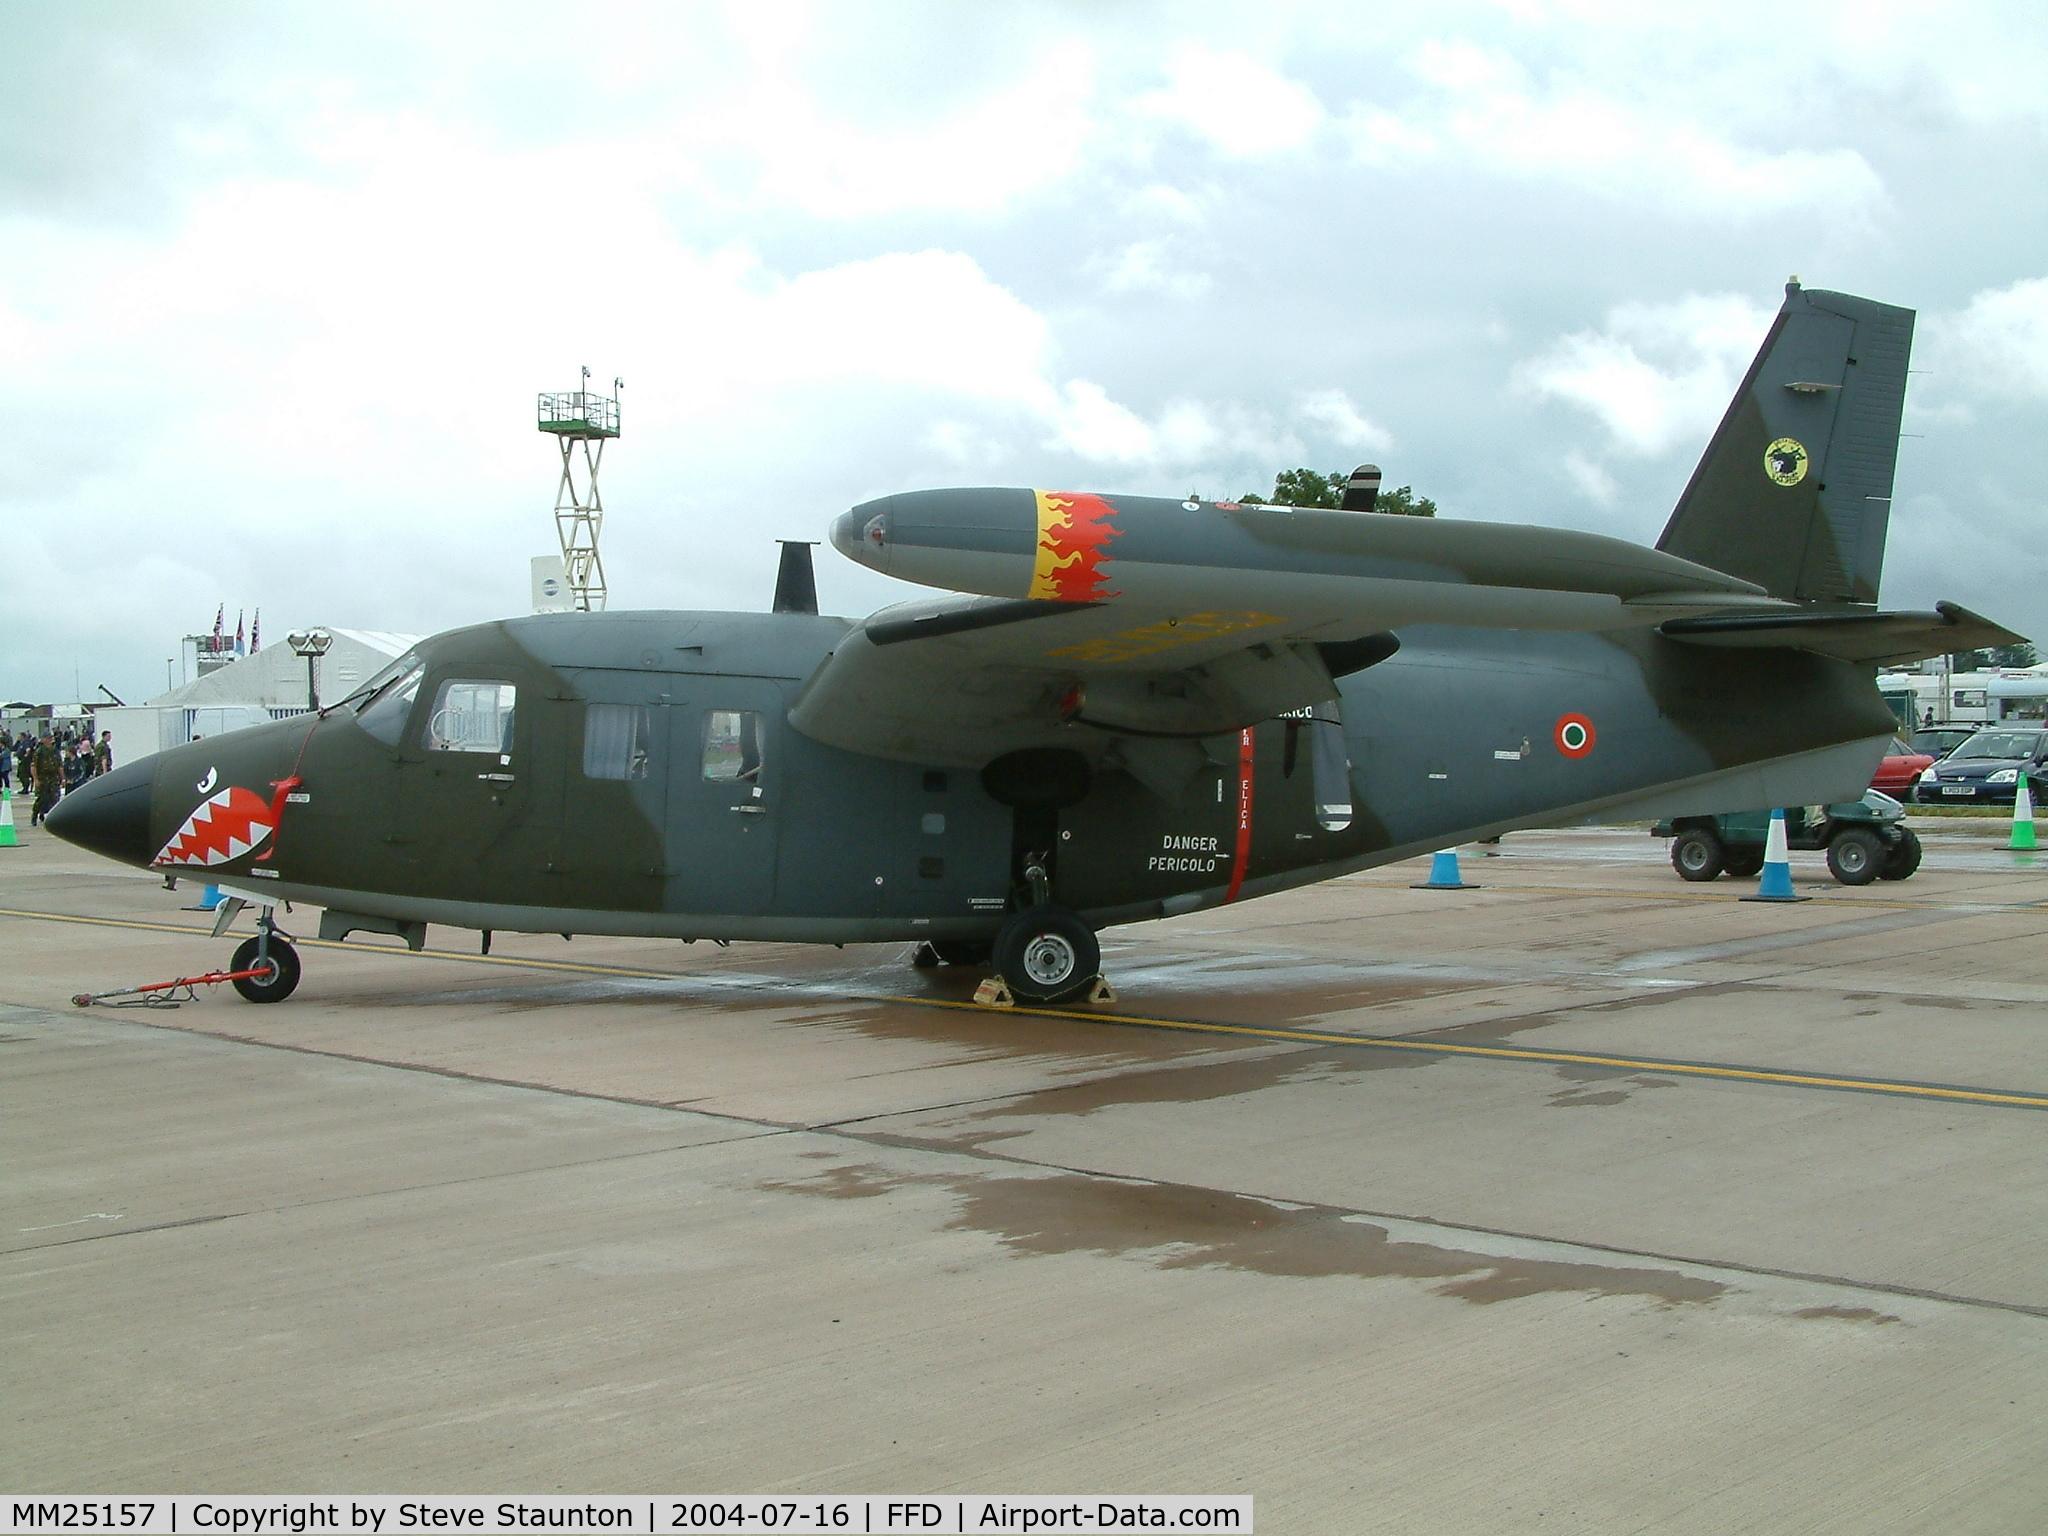 MM25157, Piaggio P-166DL-3 C/N 476, Royal International Air Tattoo 2004